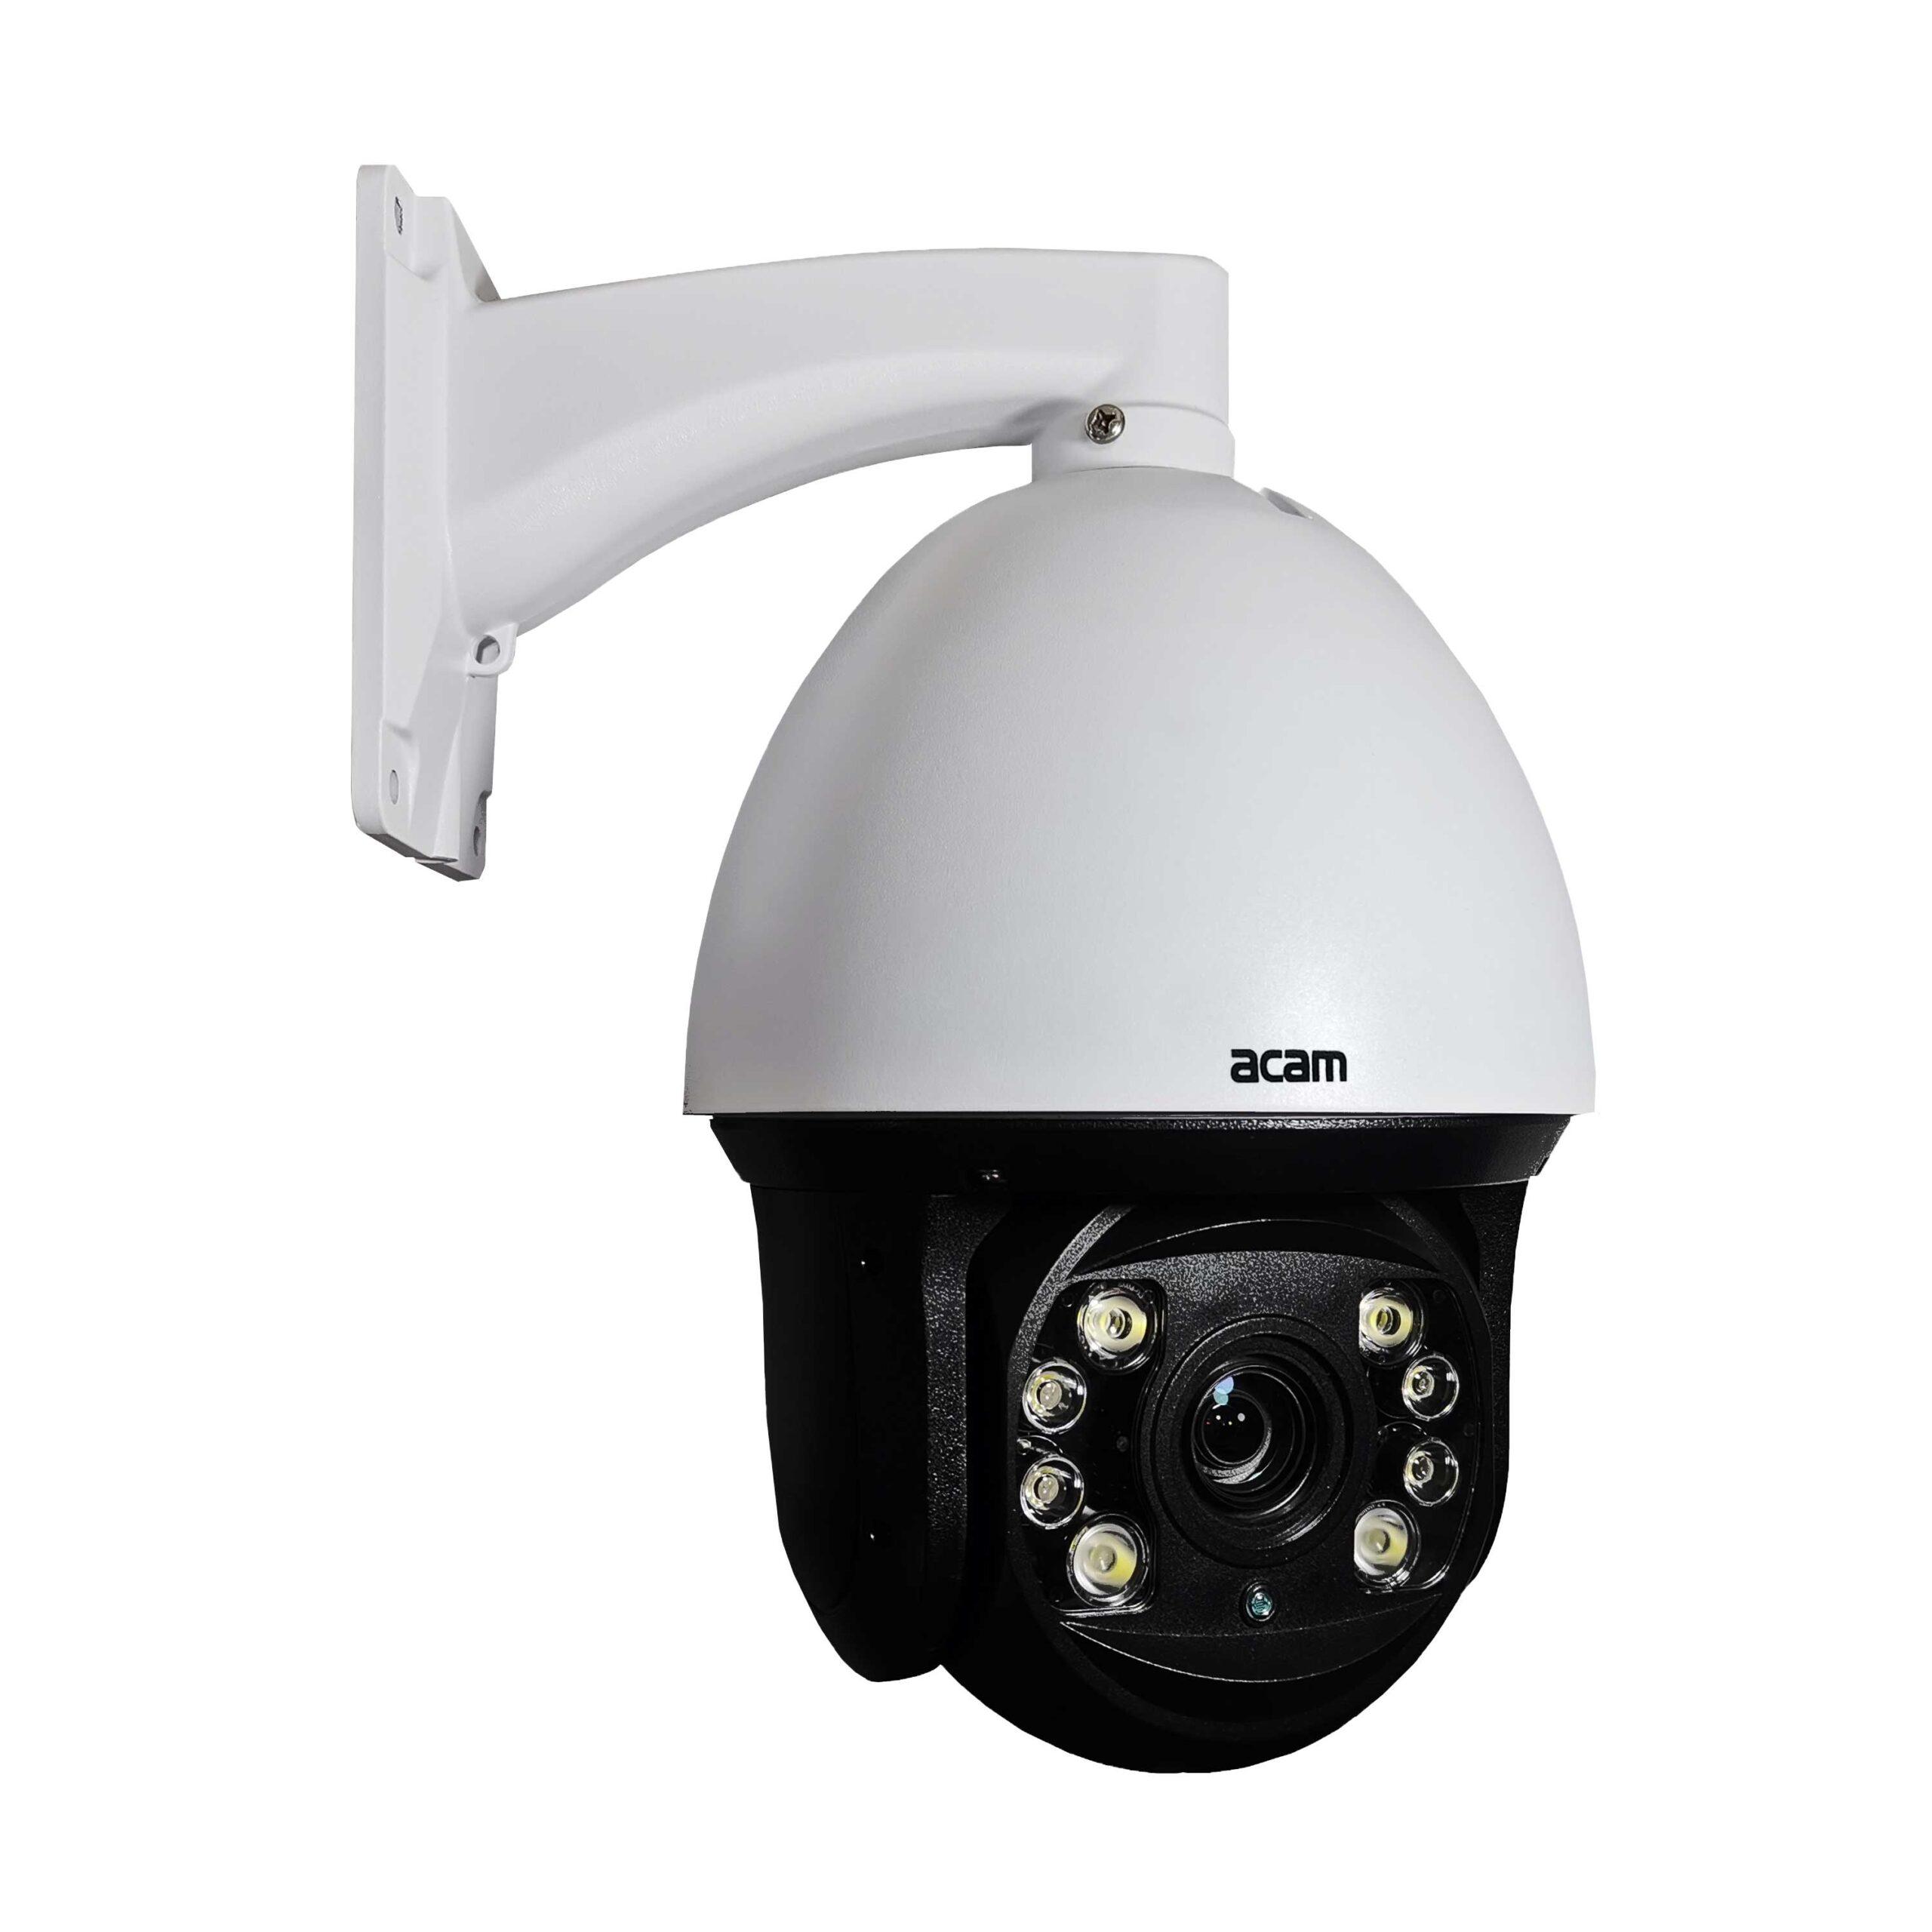 دوربین acam PS-536W